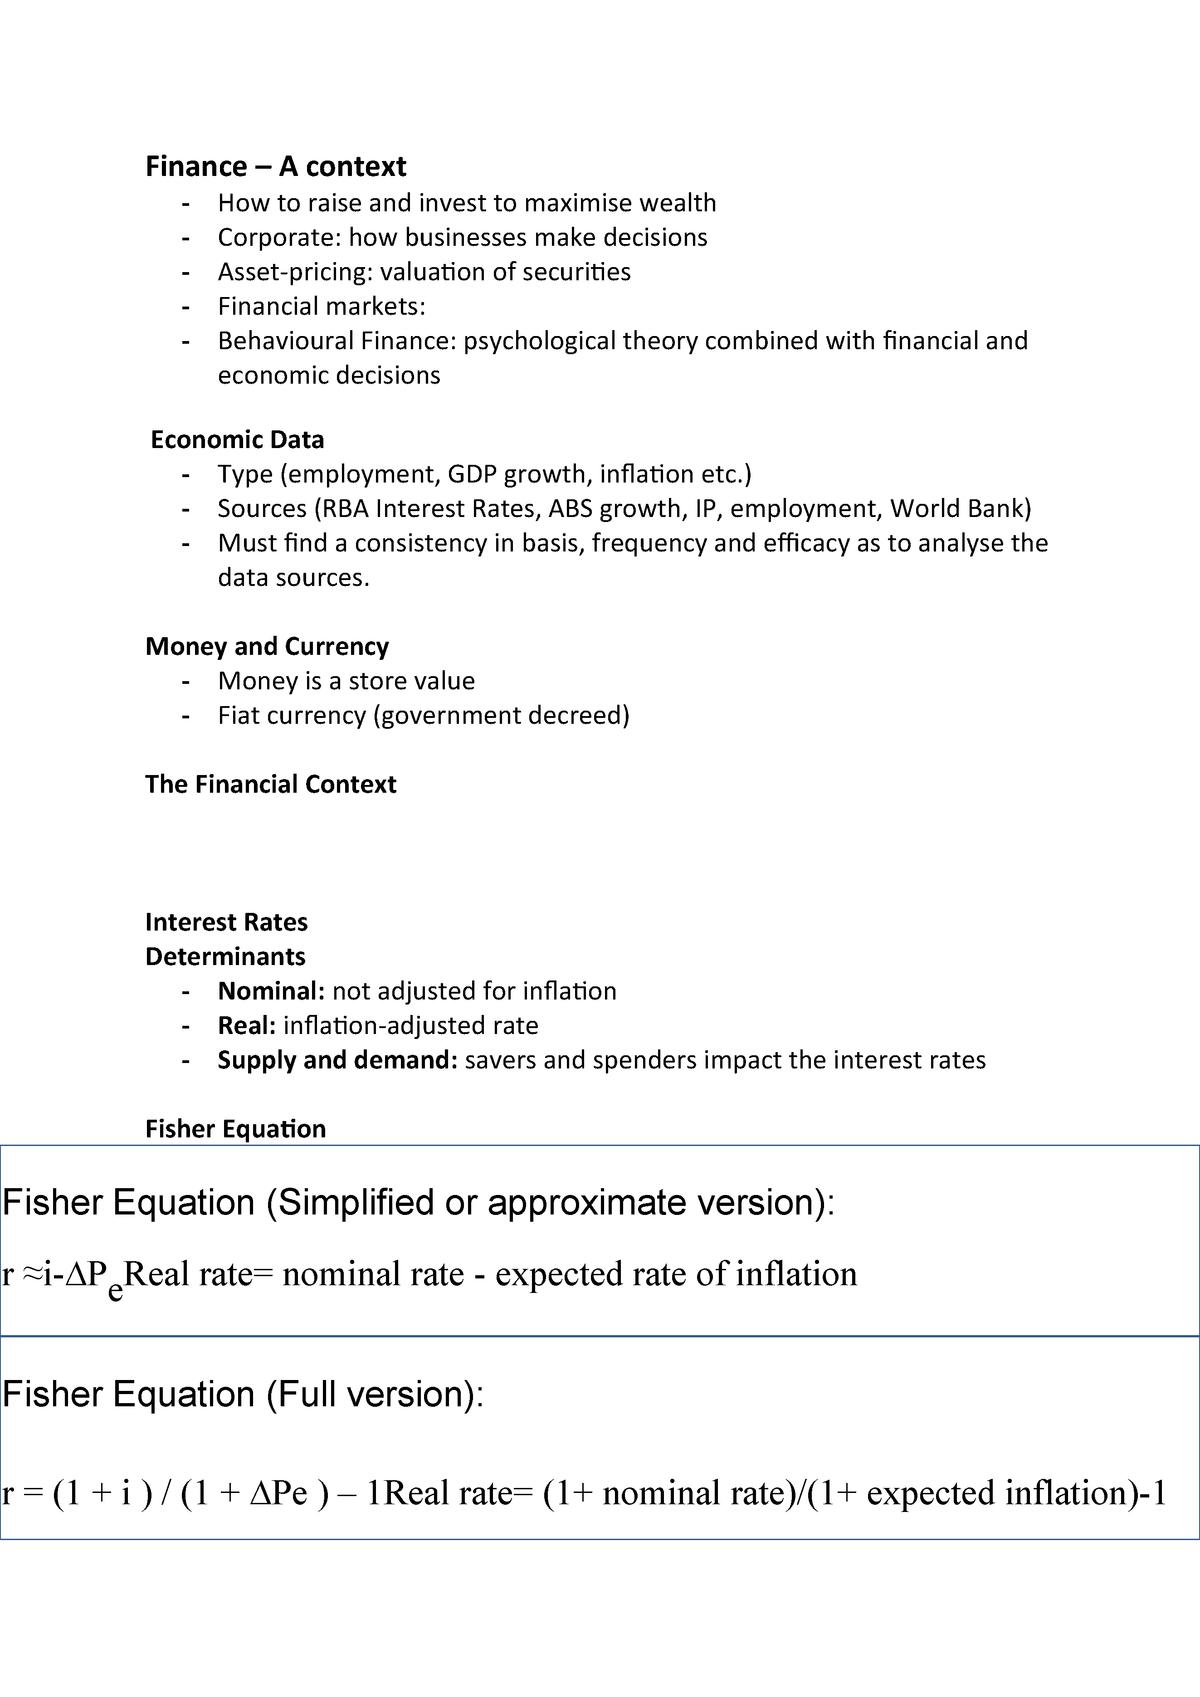 Finance L1 notes - ACST101 - MQ - StuDocu